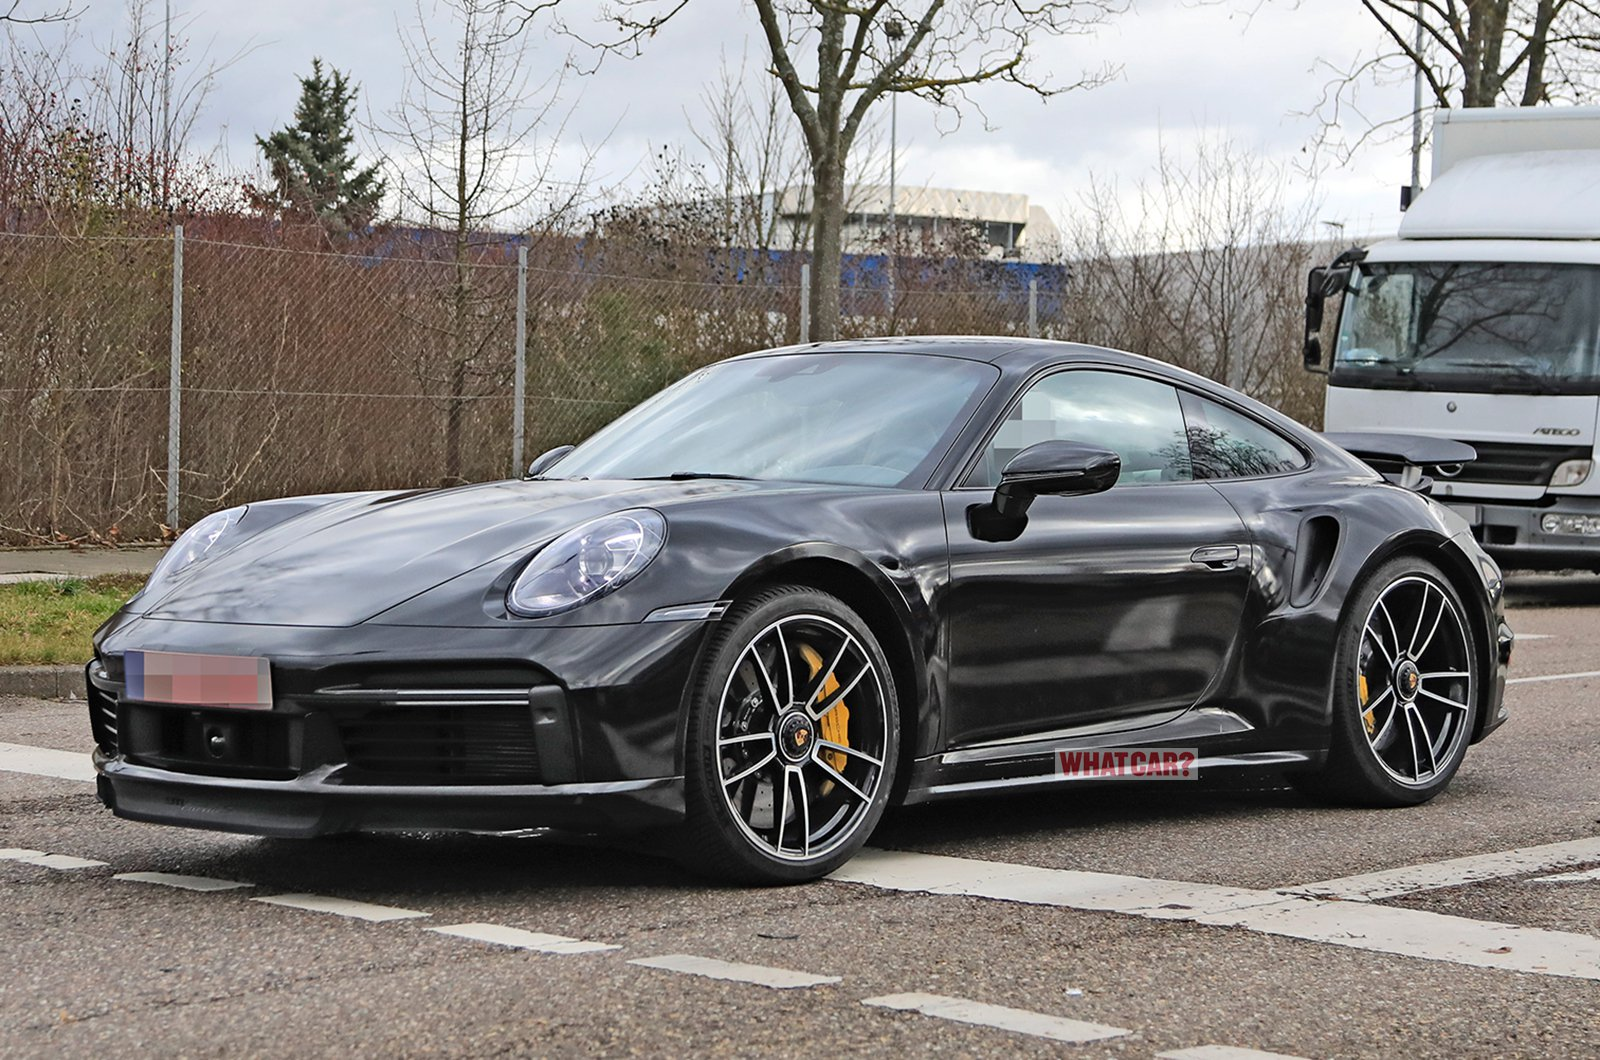 Porsche 911 Turbo S spyshot